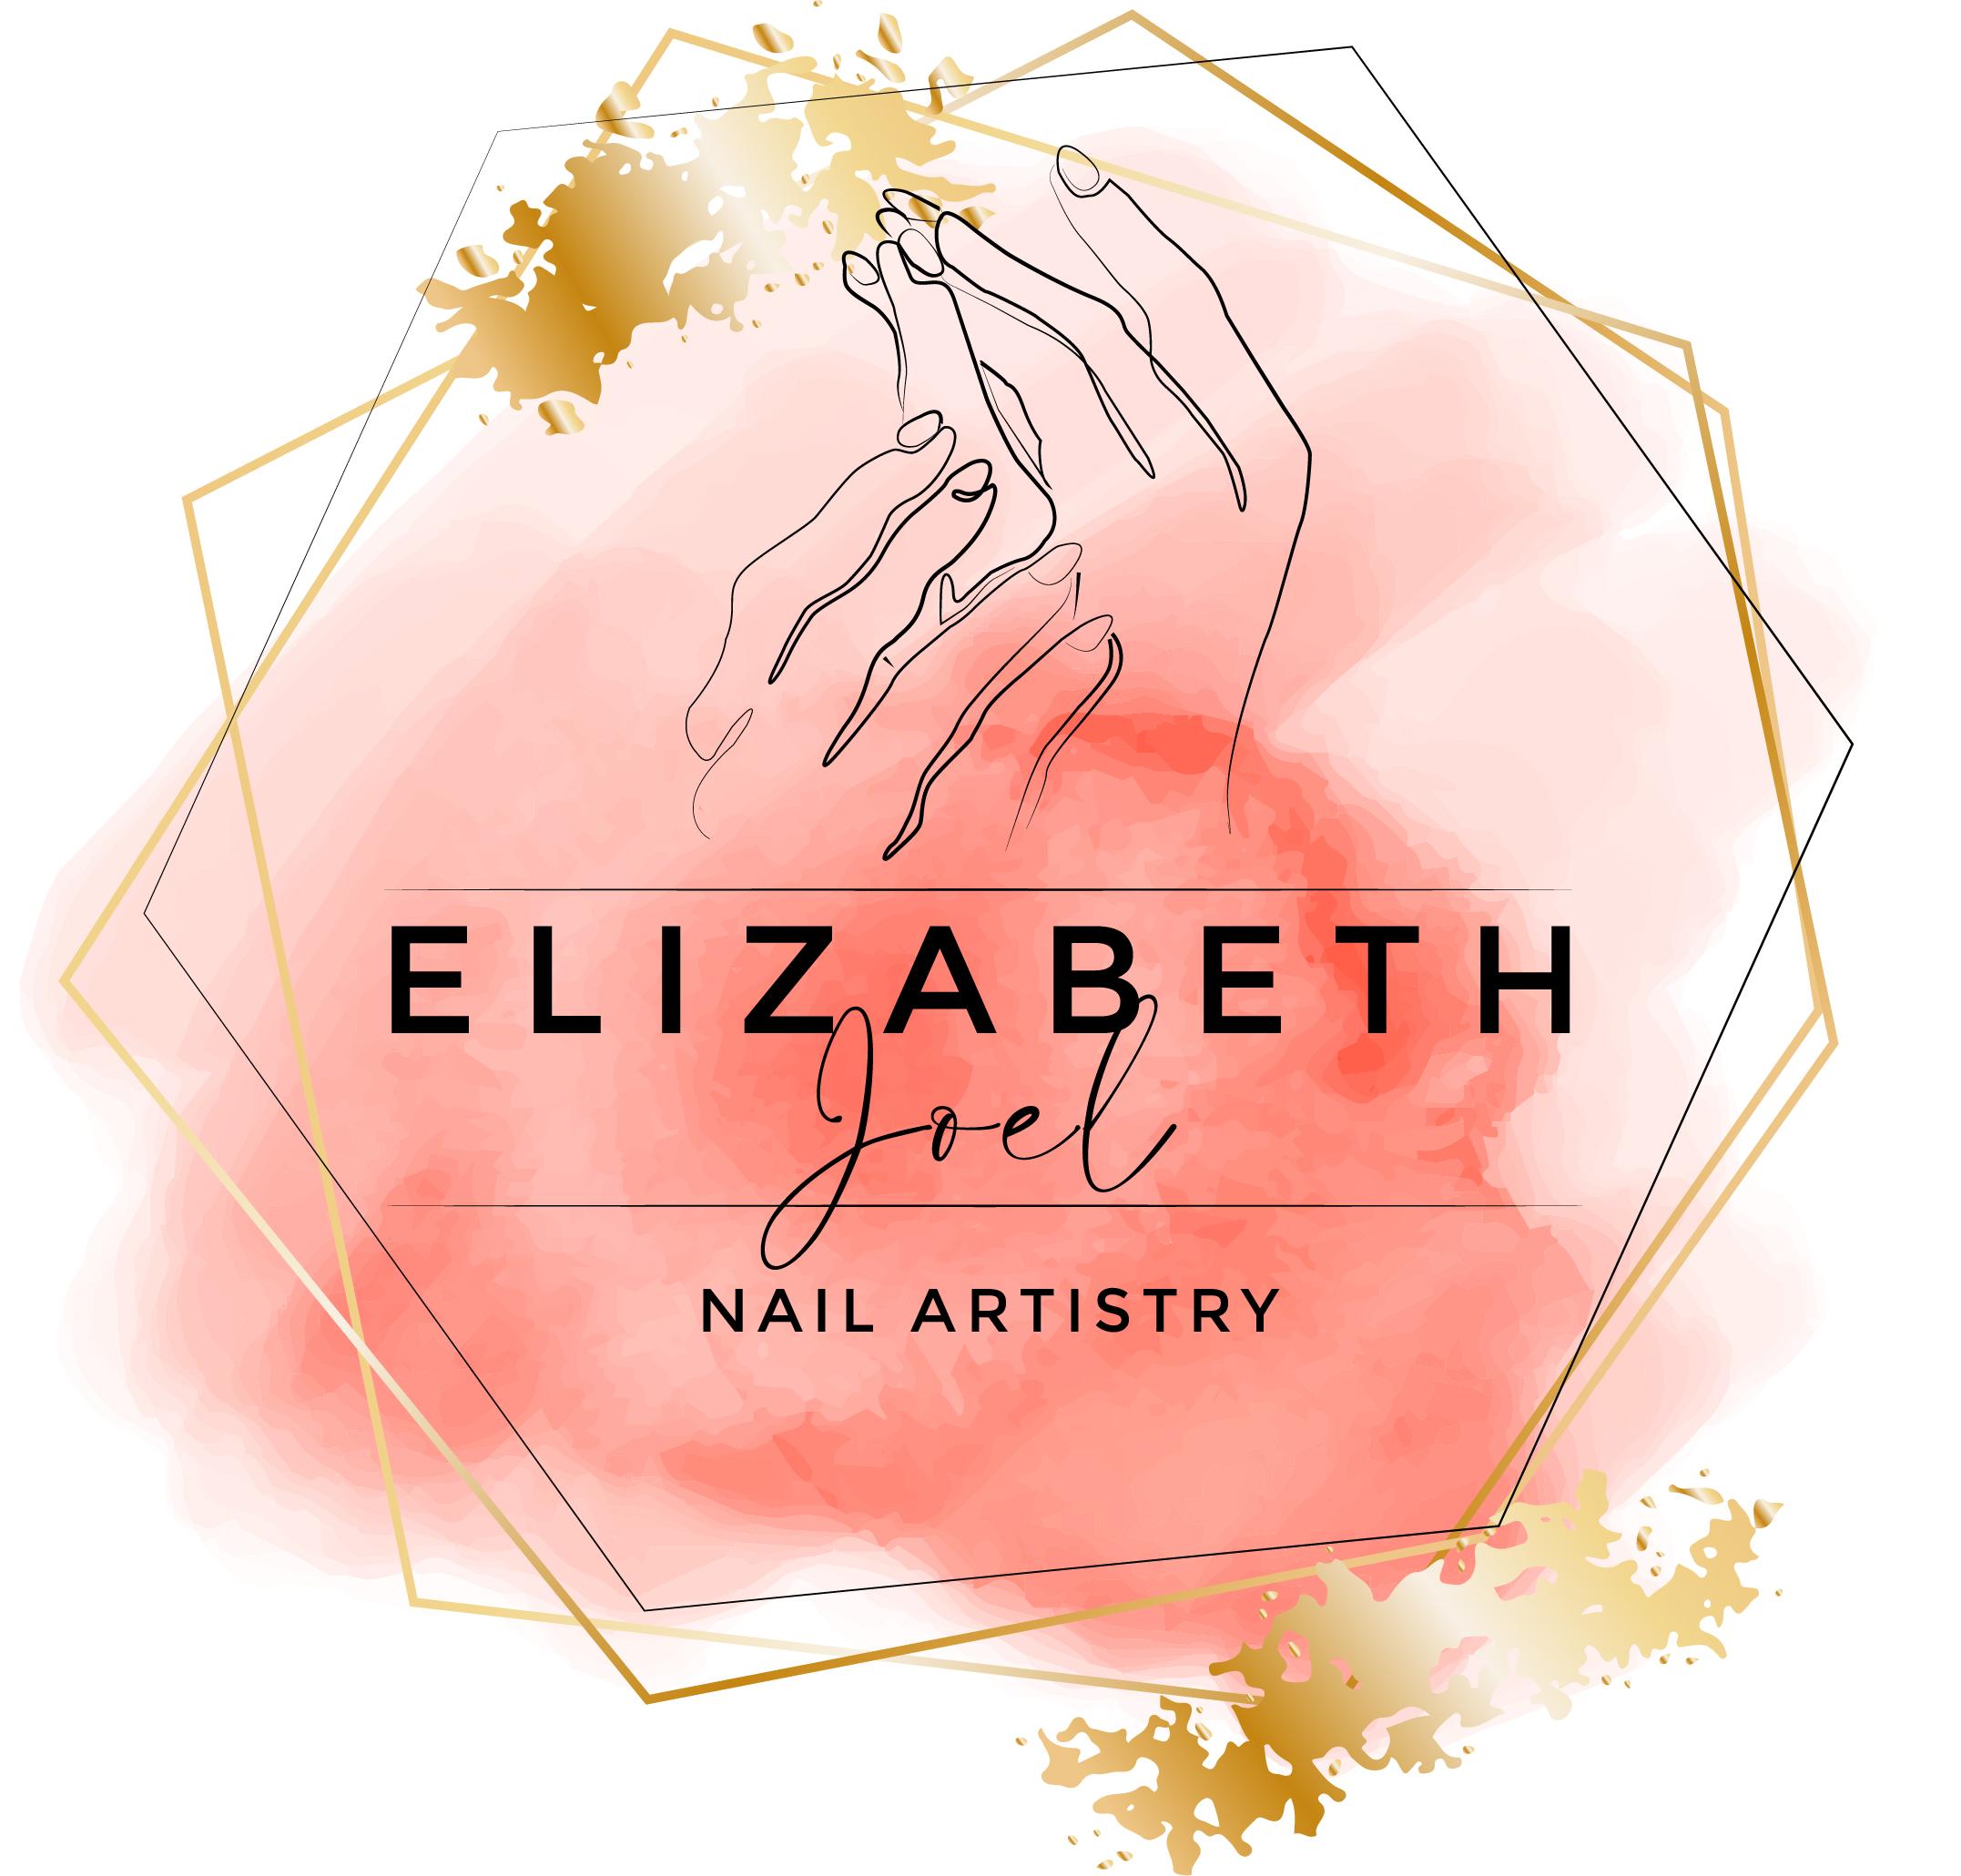 Elizabeth Joel Nail Artistry logo